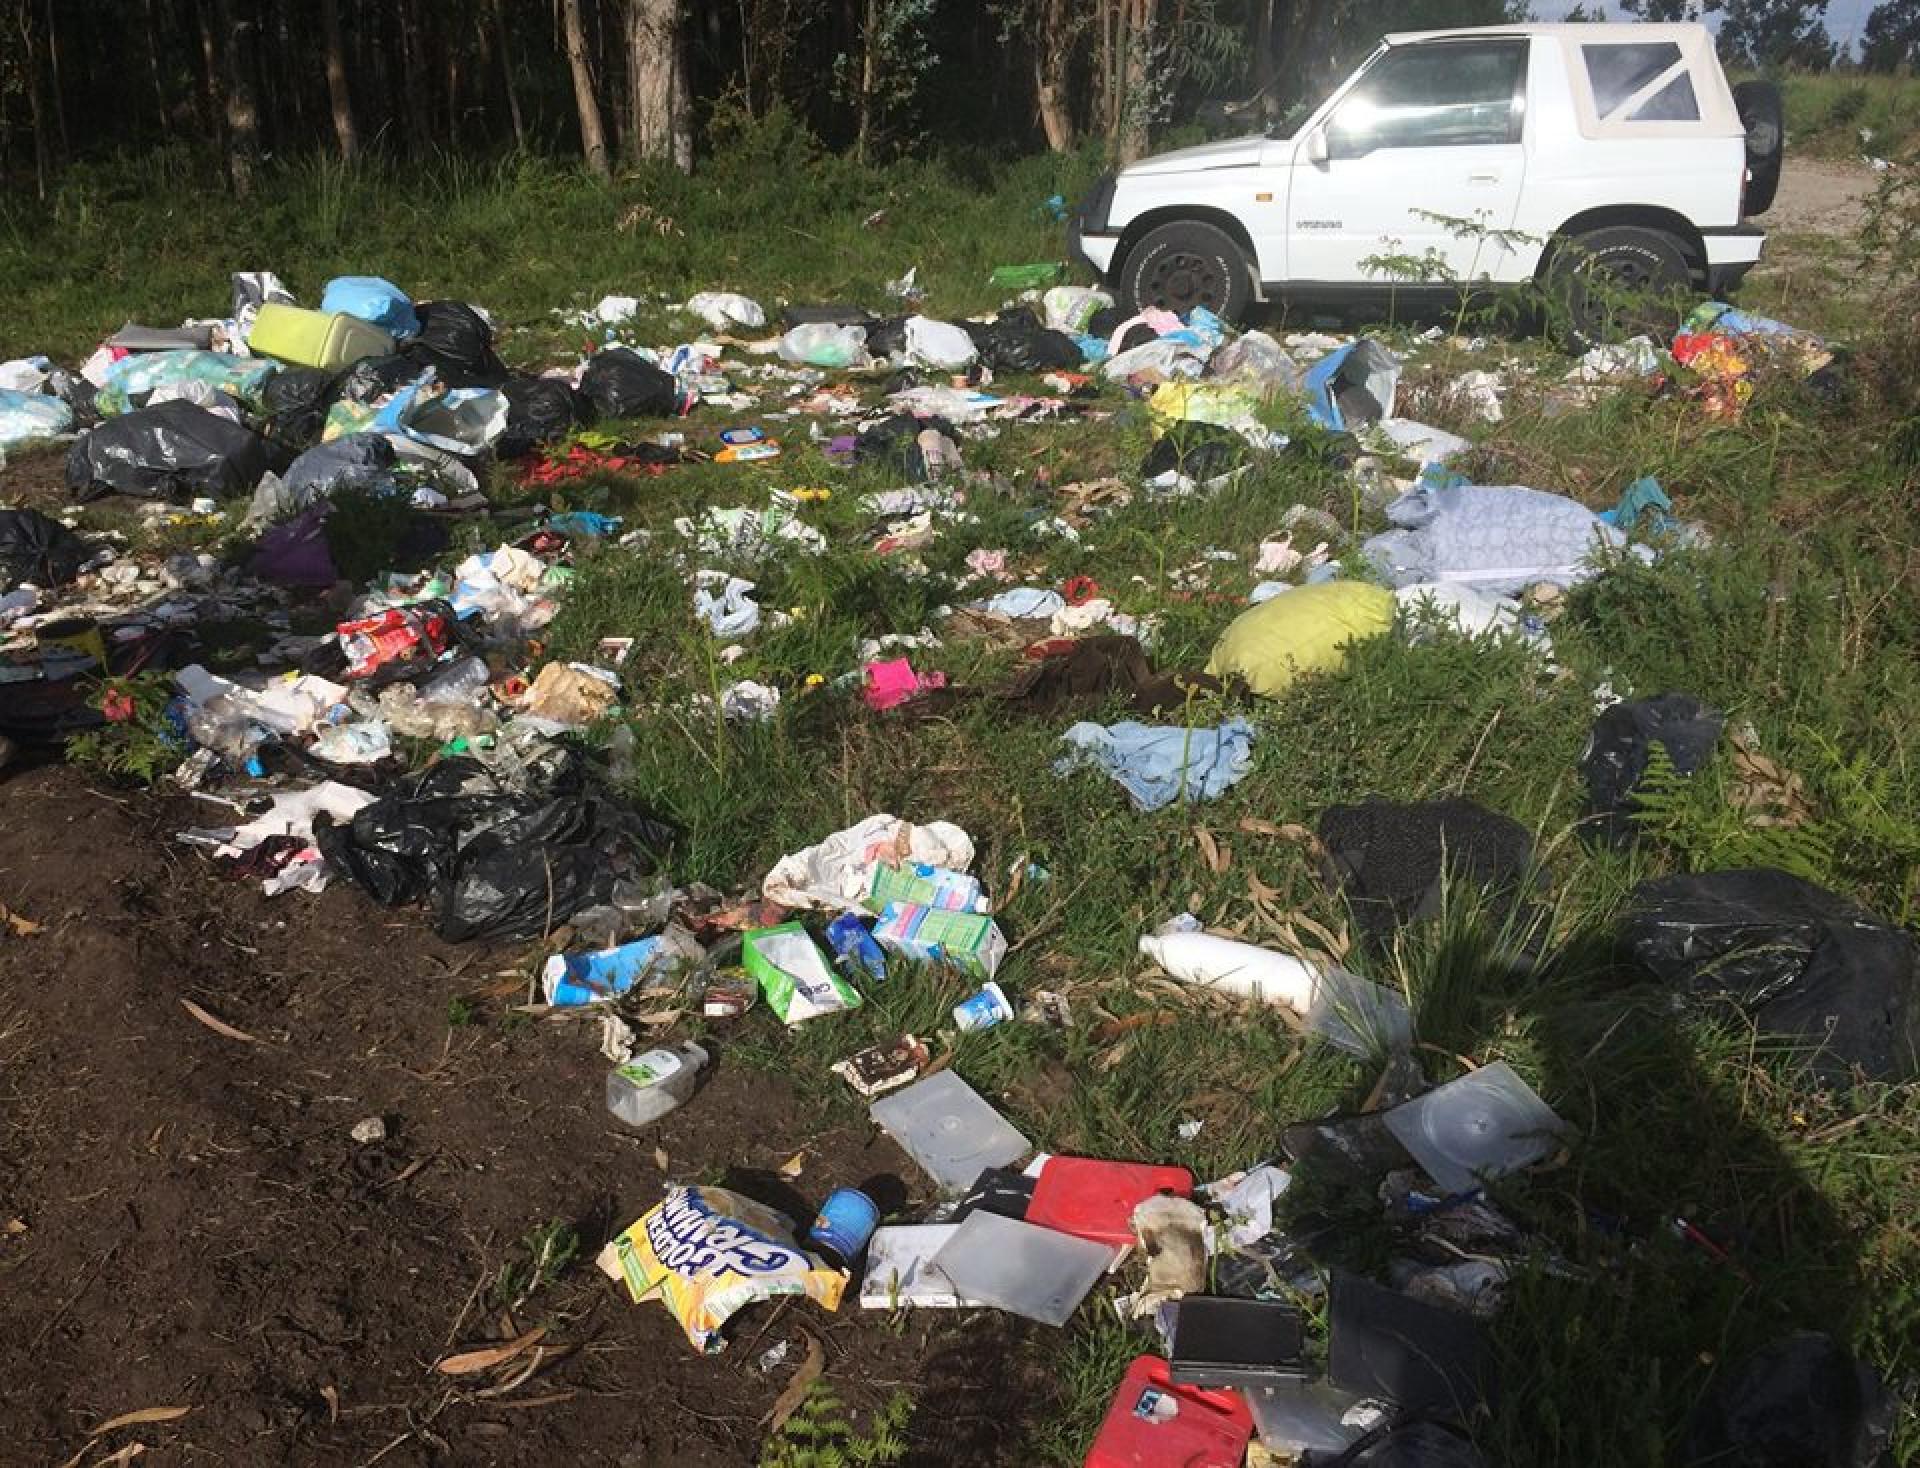 Grandes quantidades de comida, roupa e lixo abandonadas em terreno baldio